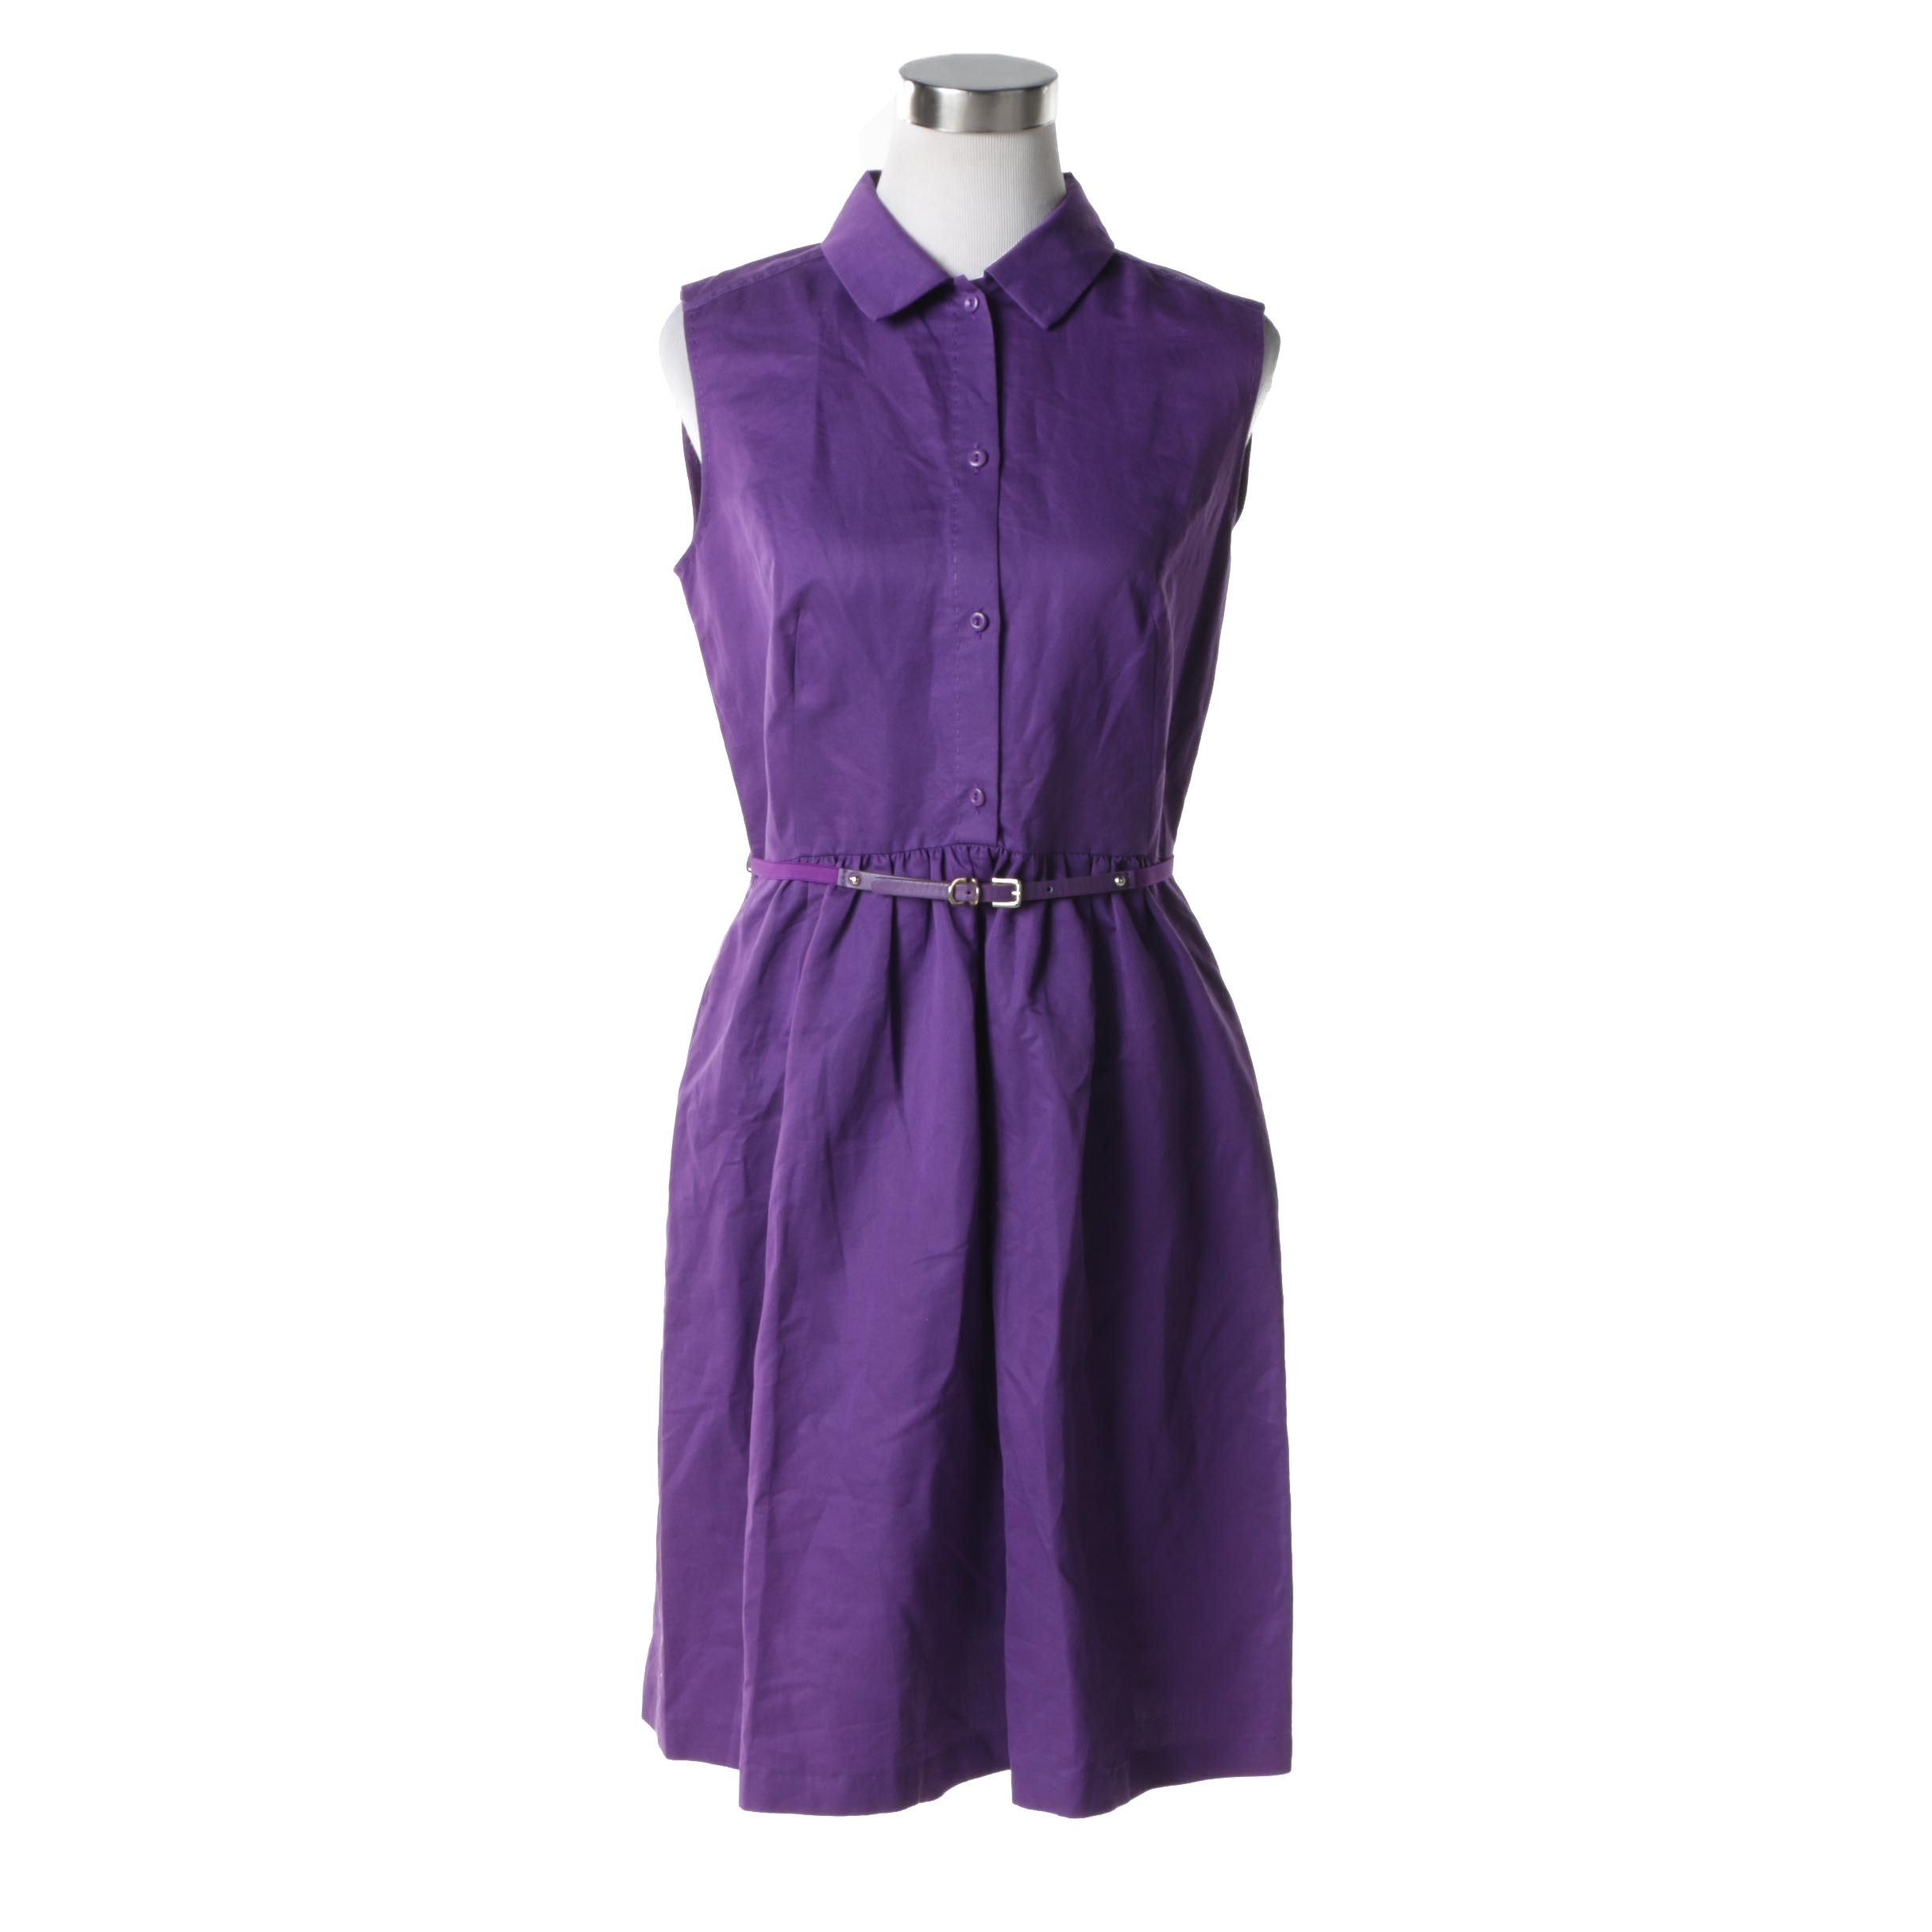 Max Mara Studio Purple Cotton Sleeveless Shirtwaist Dress